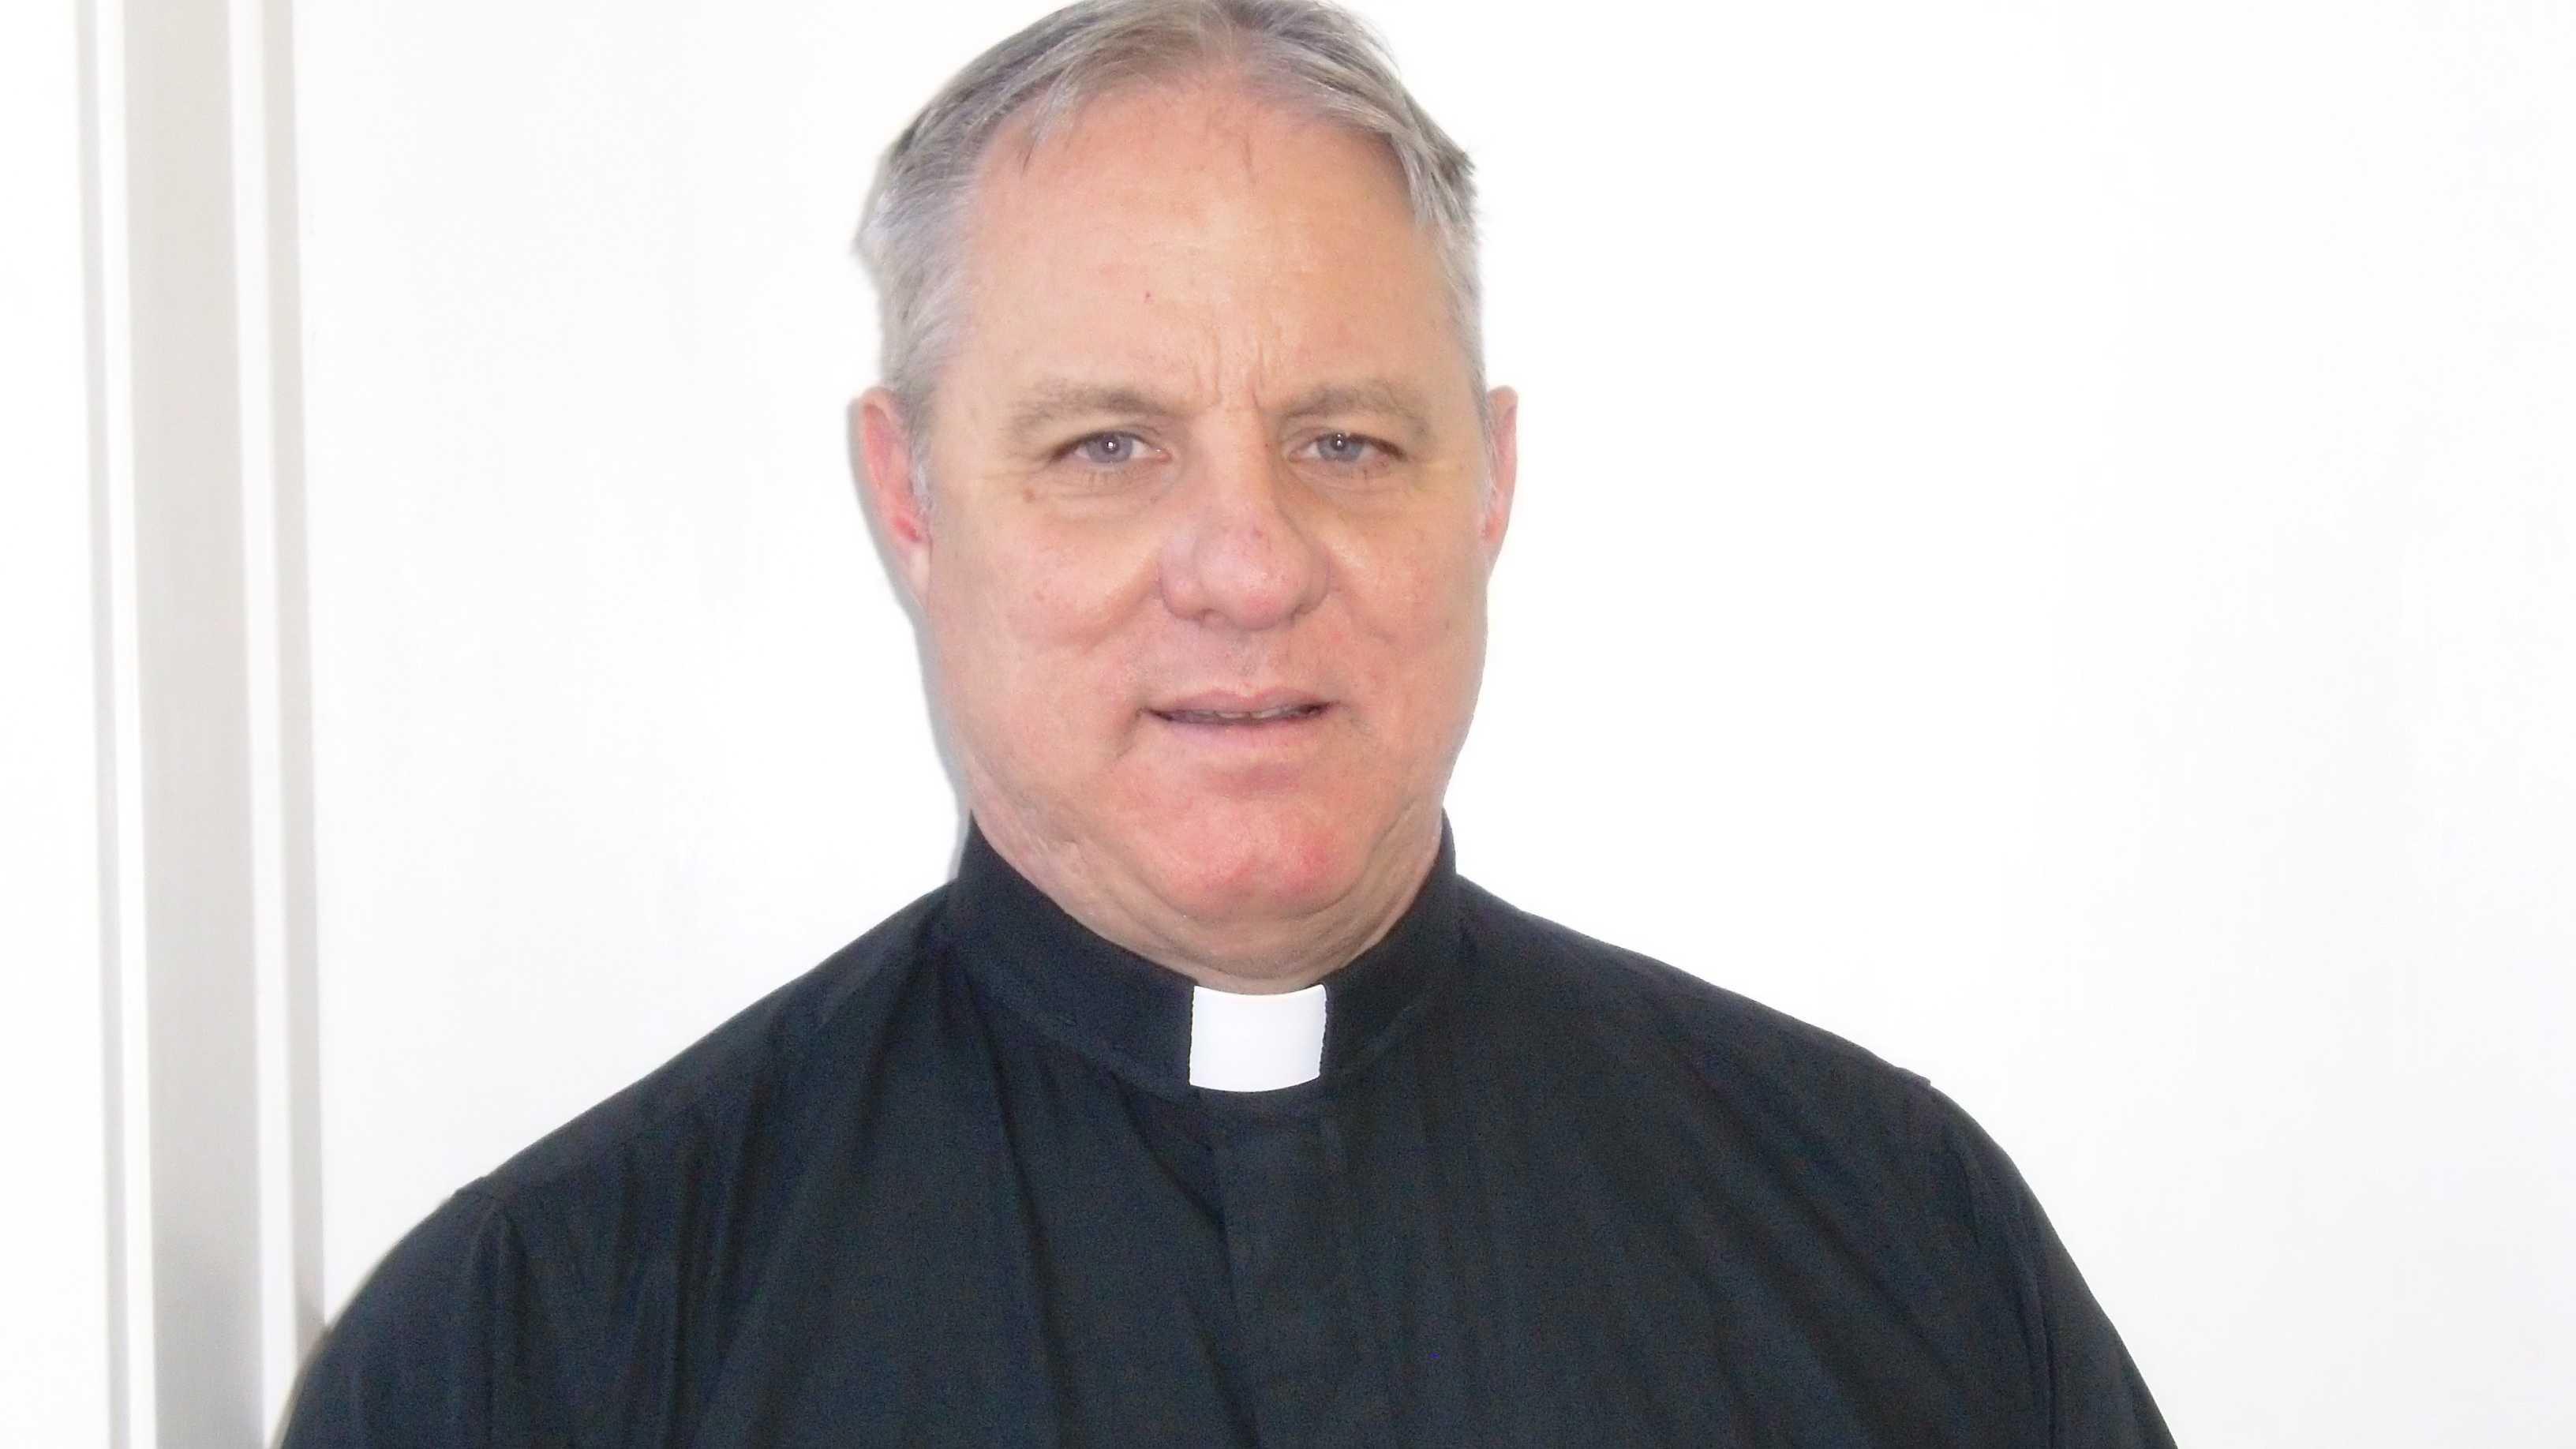 Father Eric Freed